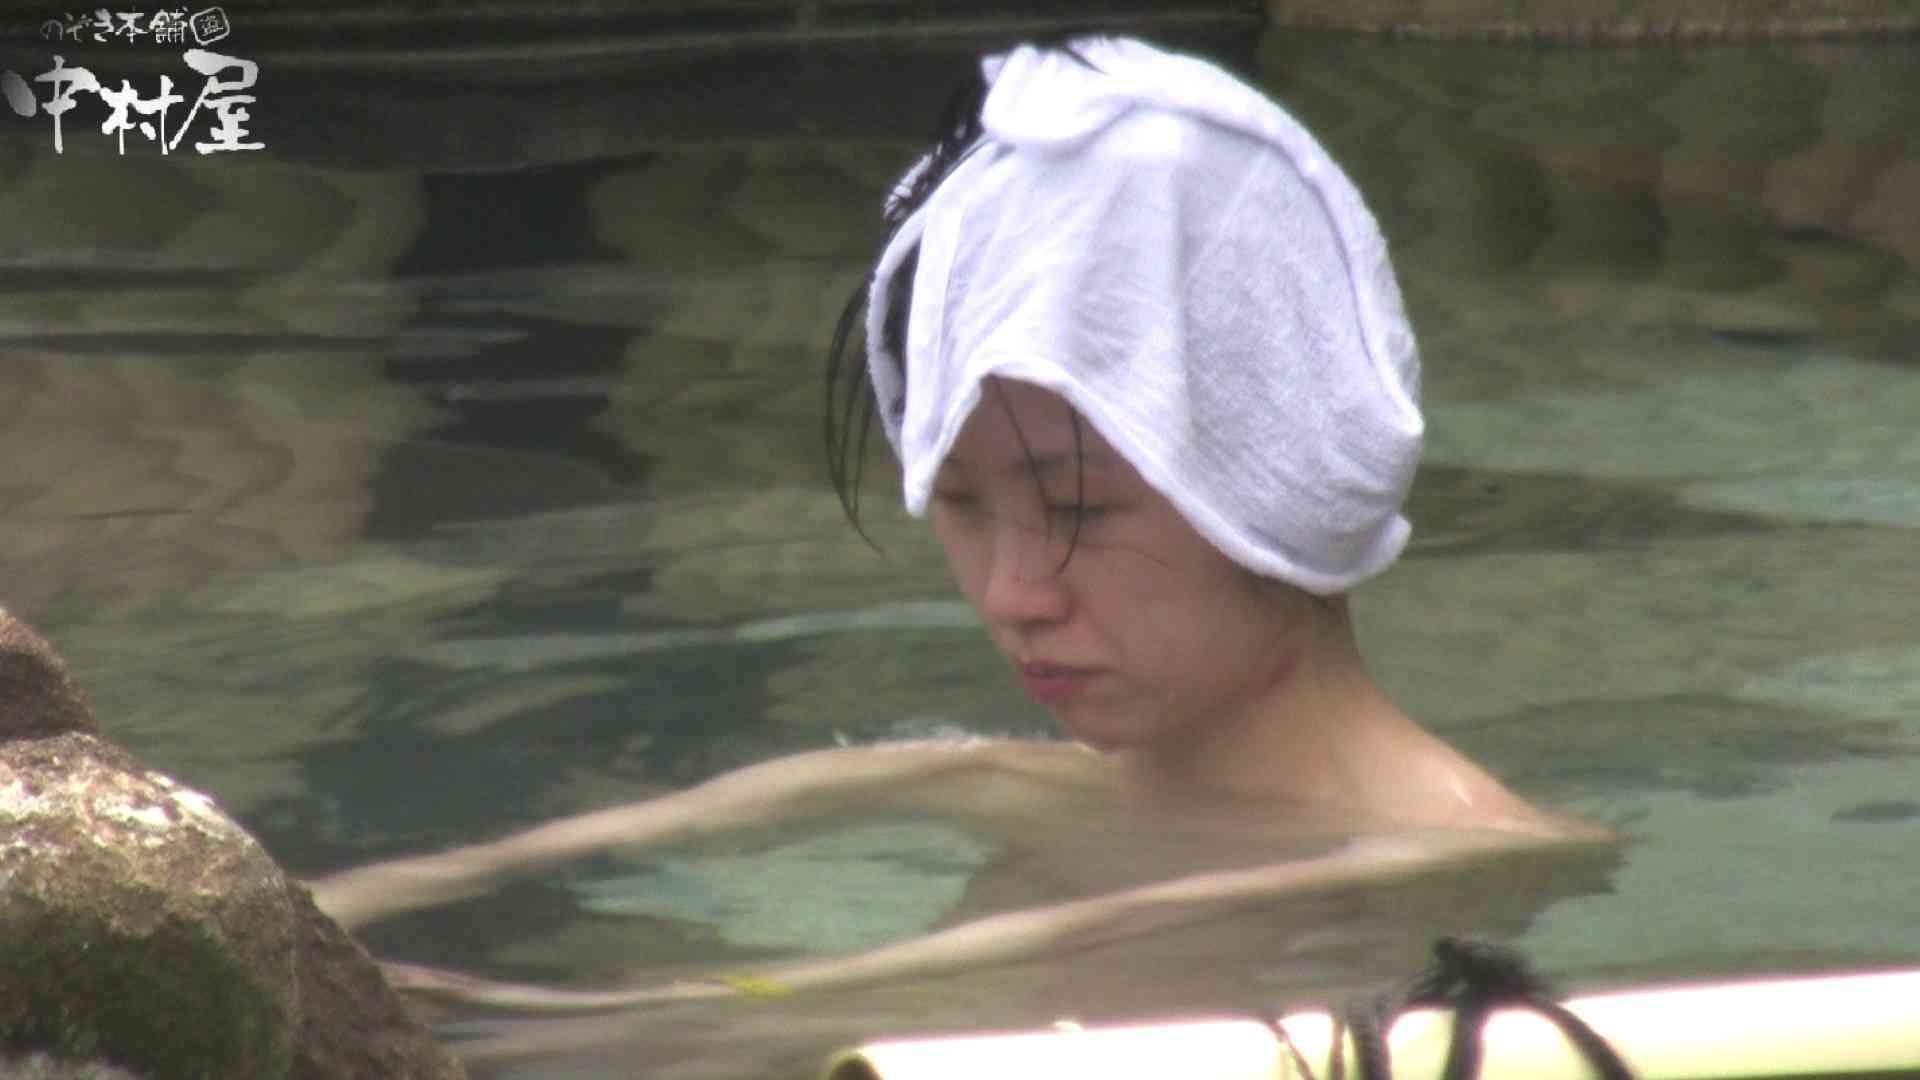 Aquaな露天風呂Vol.909 盗撮シリーズ | 露天風呂編  91PIX 47